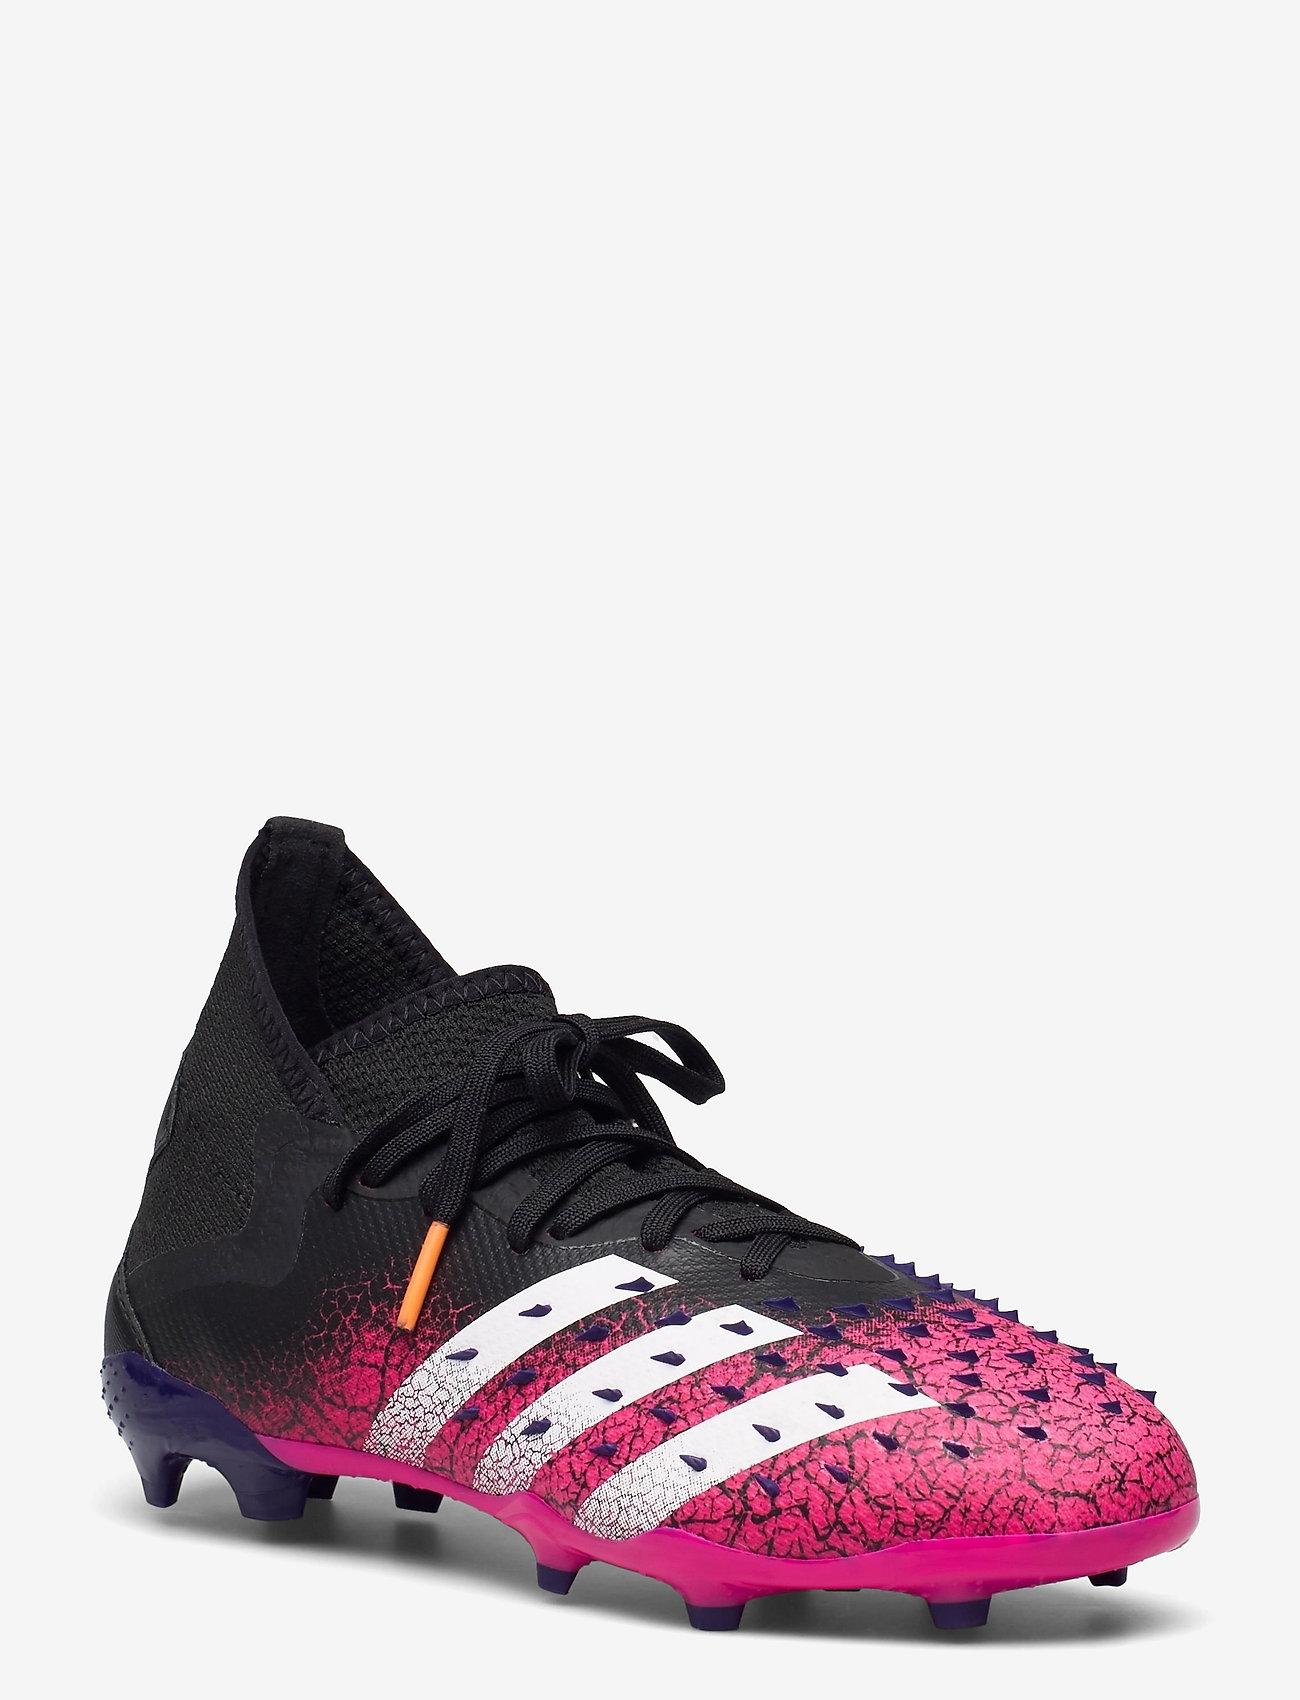 adidas Performance - PREDATOR FREAK .2 FG - fotballsko - cblack/ftwwht/shopnk - 0